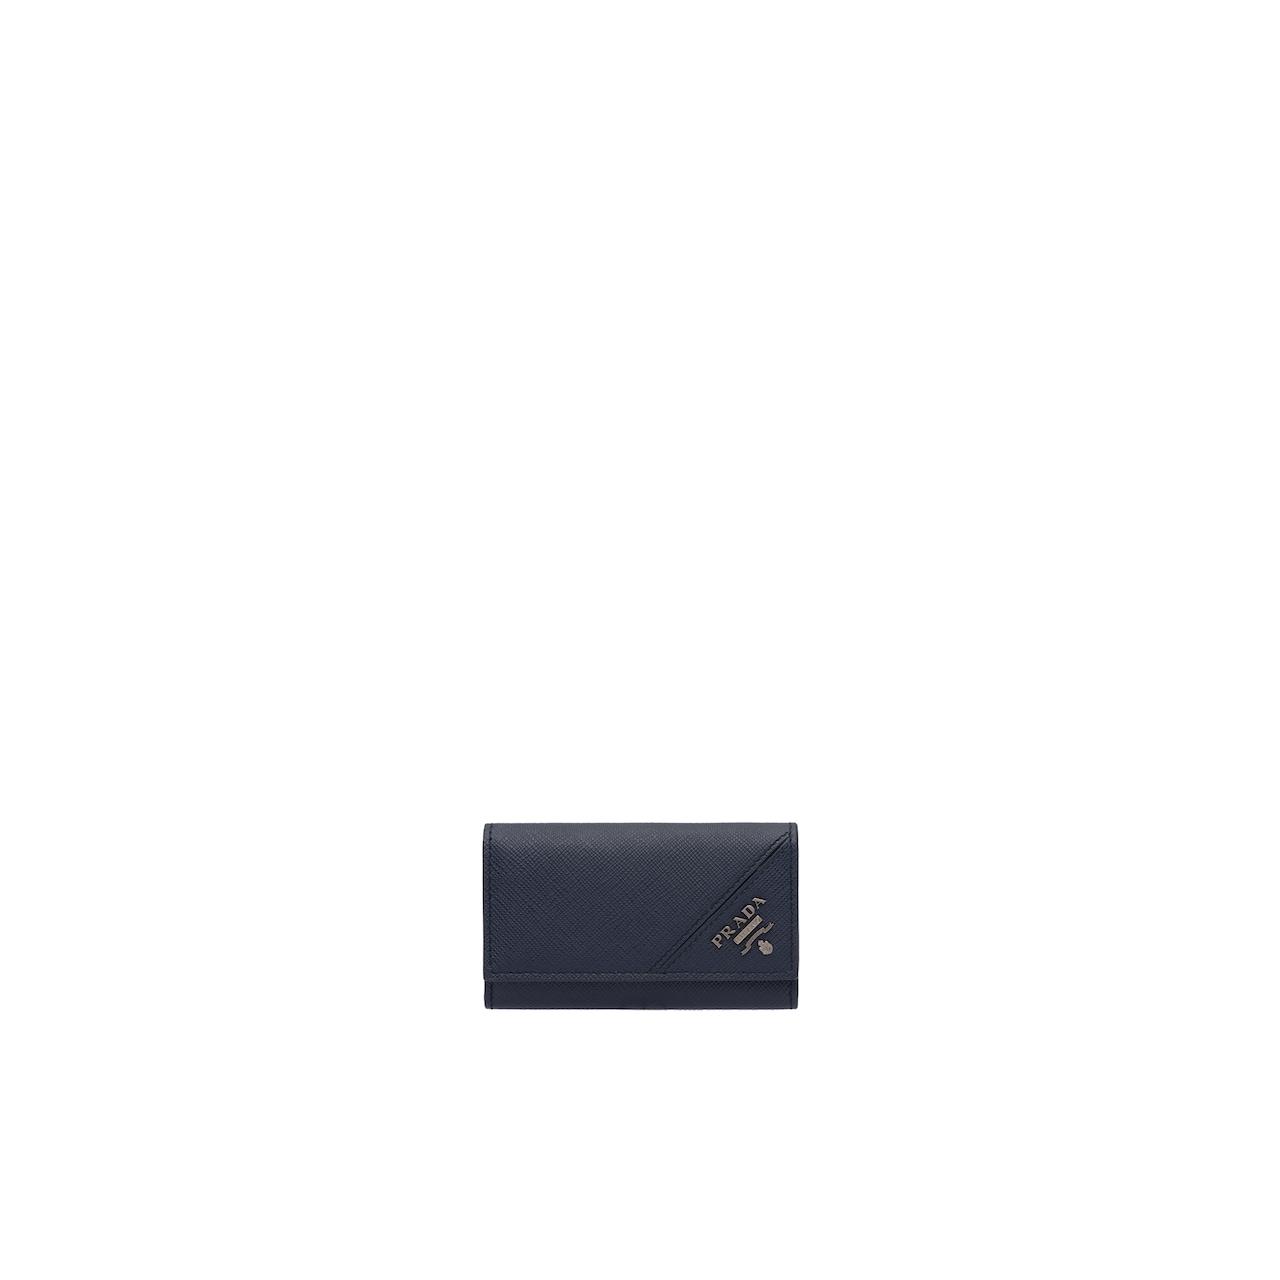 Prada 6匙Saffiano 皮革钥匙包 1